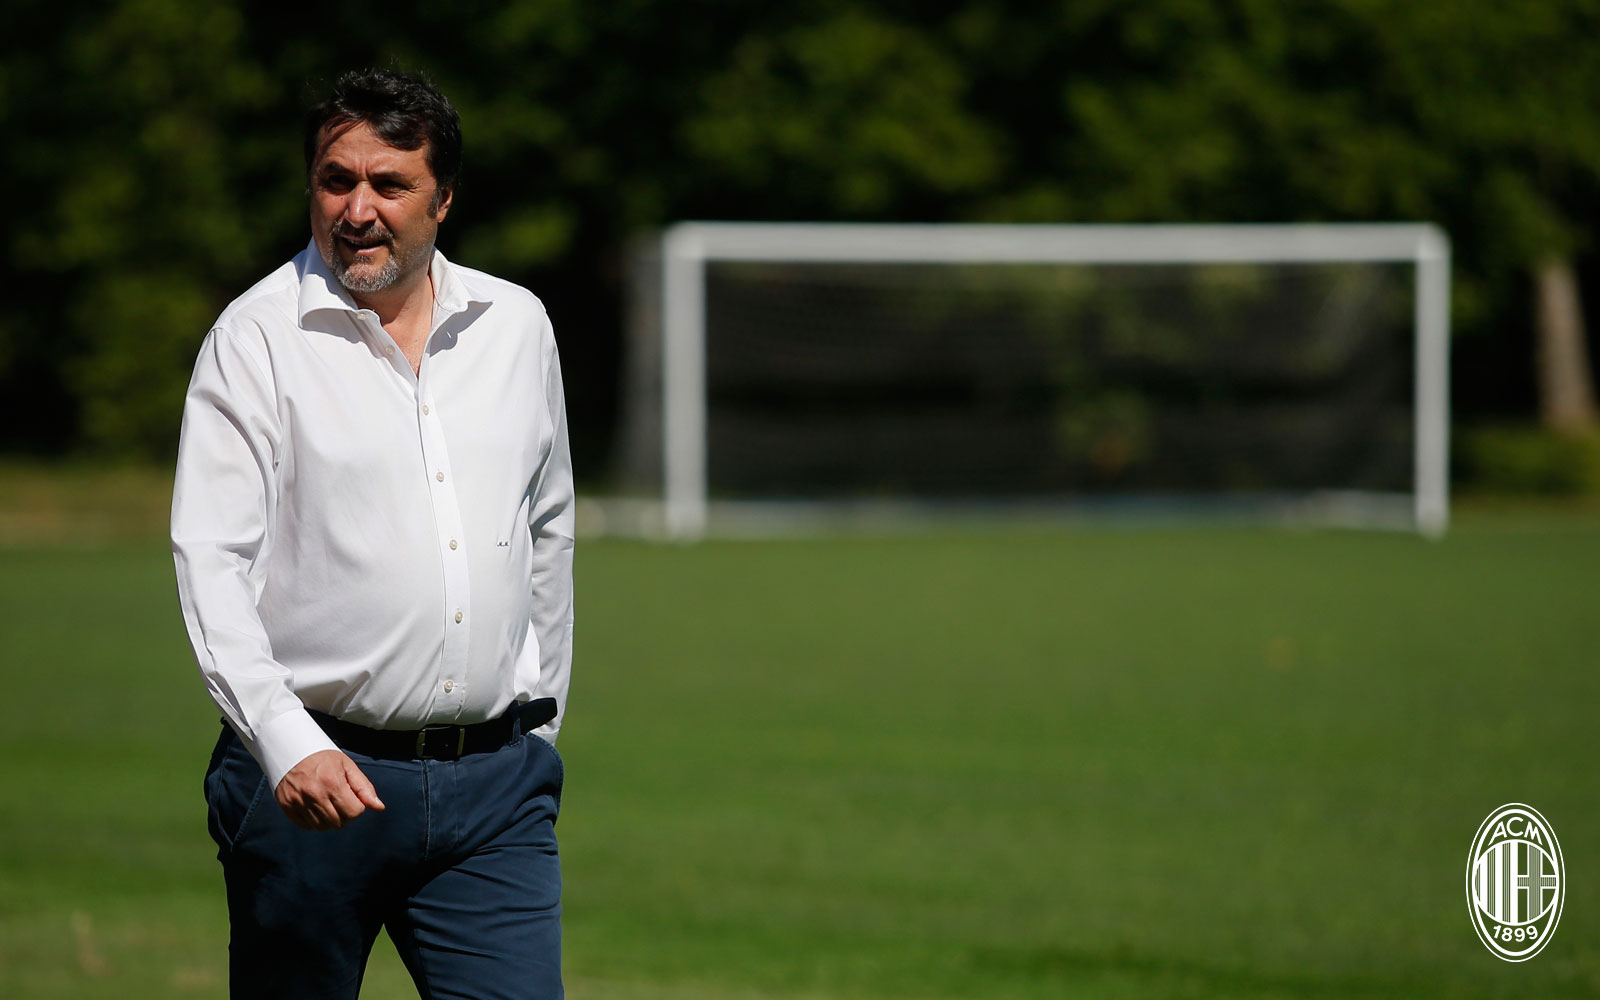 Massimiliano Mirabelli during training at Milanello. (@acmilan.com)